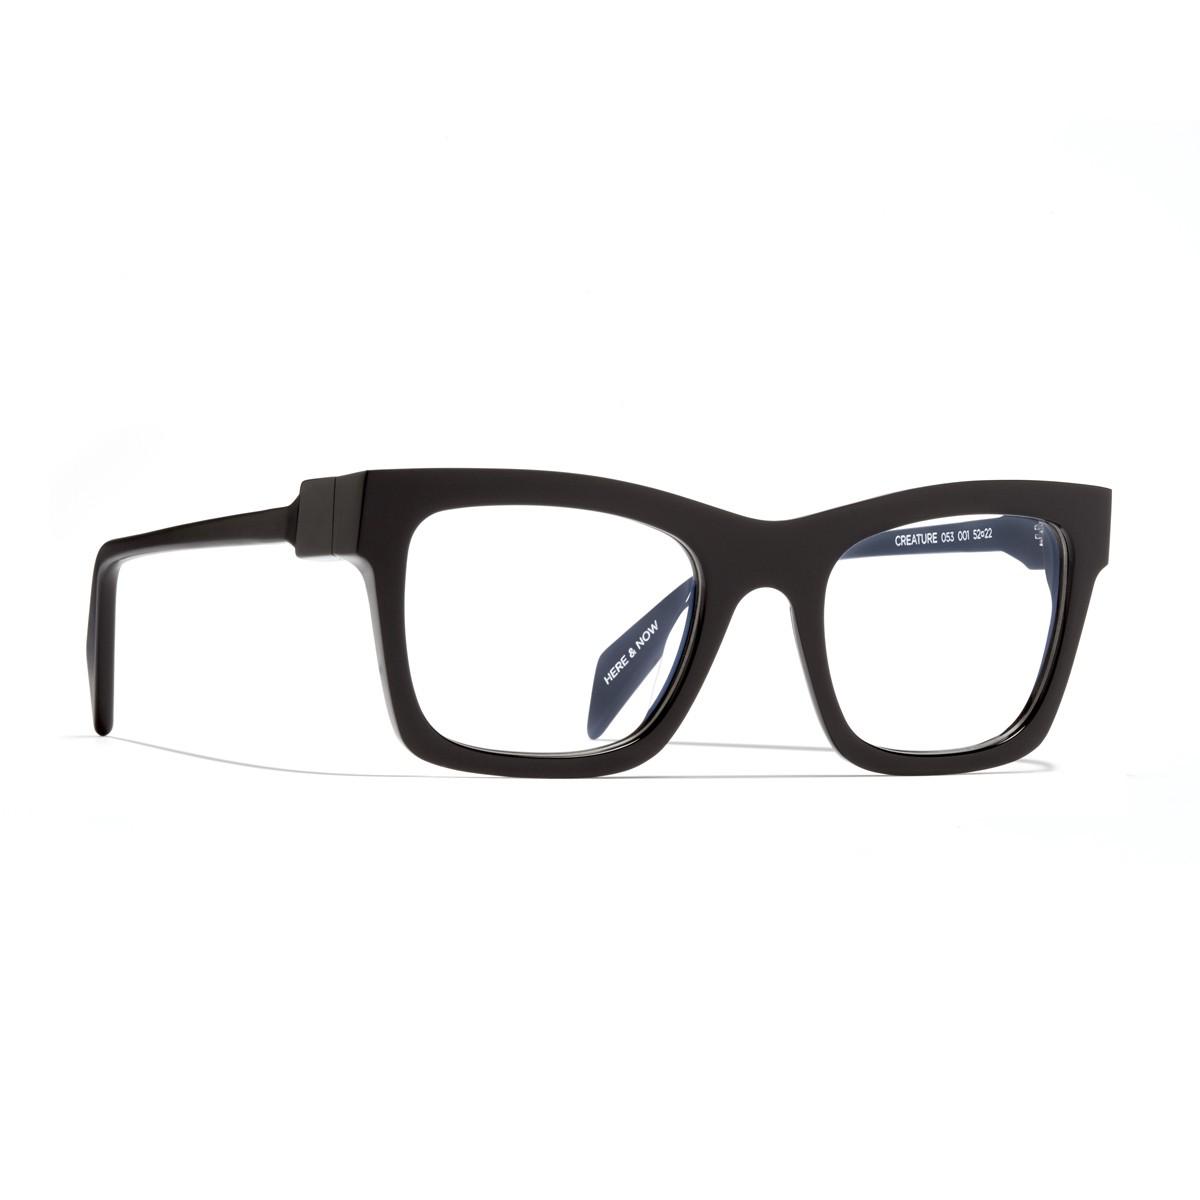 Siens Eye code 053   Occhiali da vista Unisex